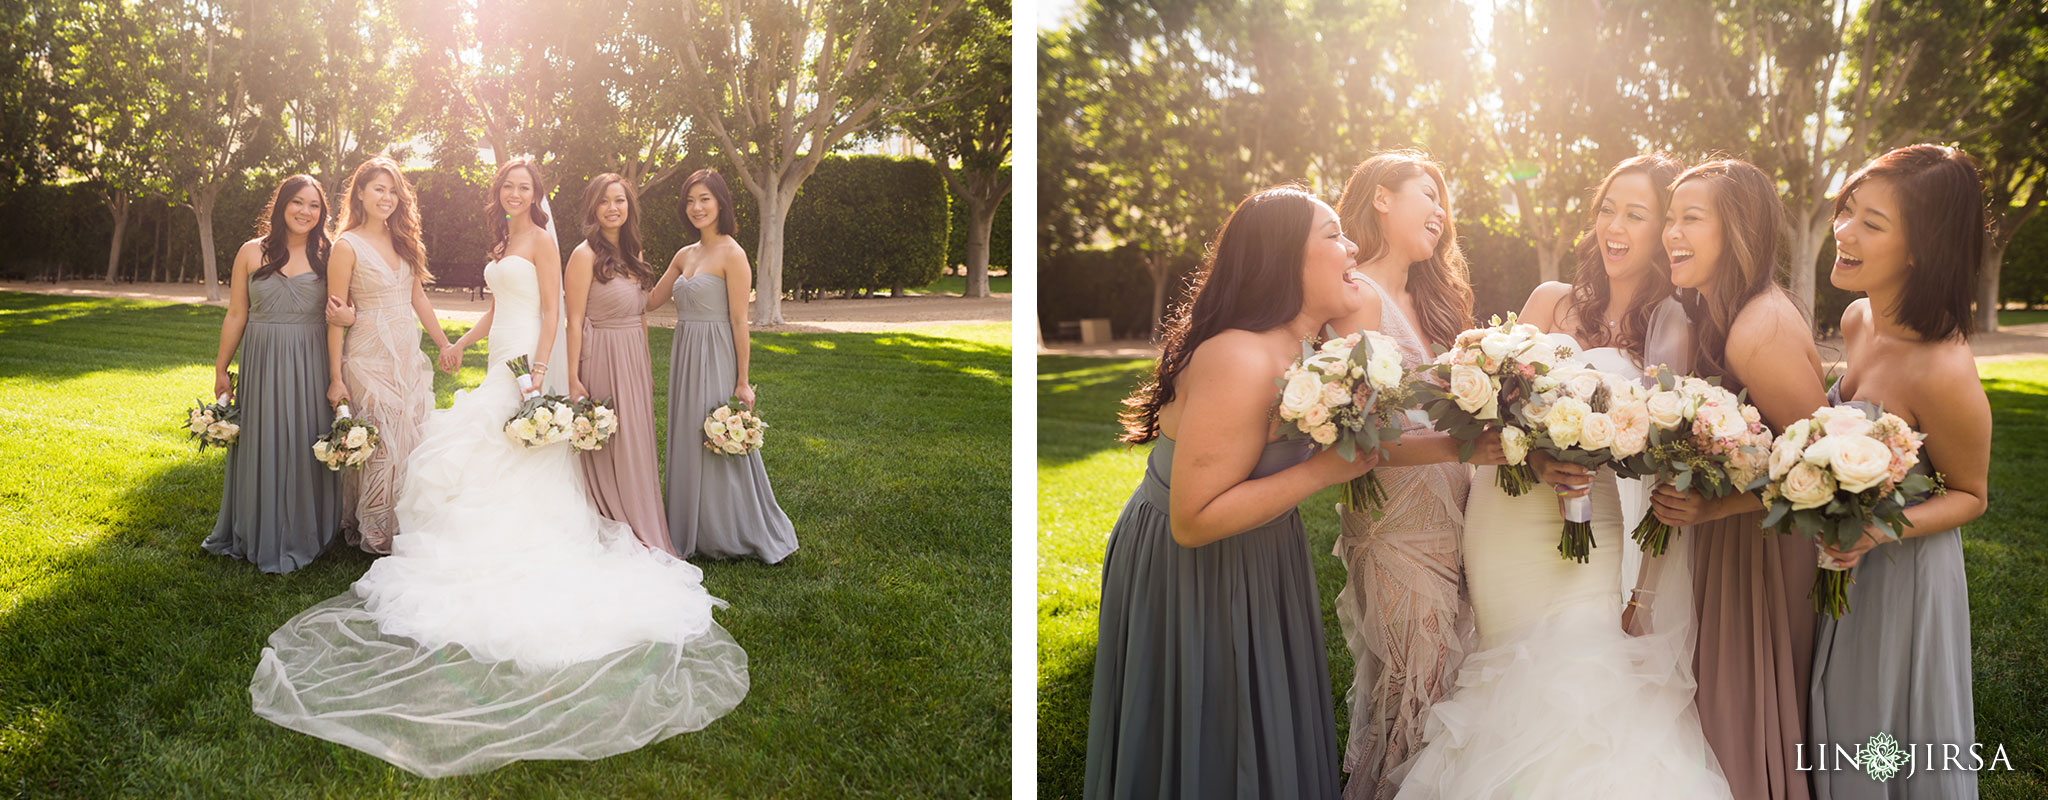 04 hotel irvine orange county bridesmaids wedding photography